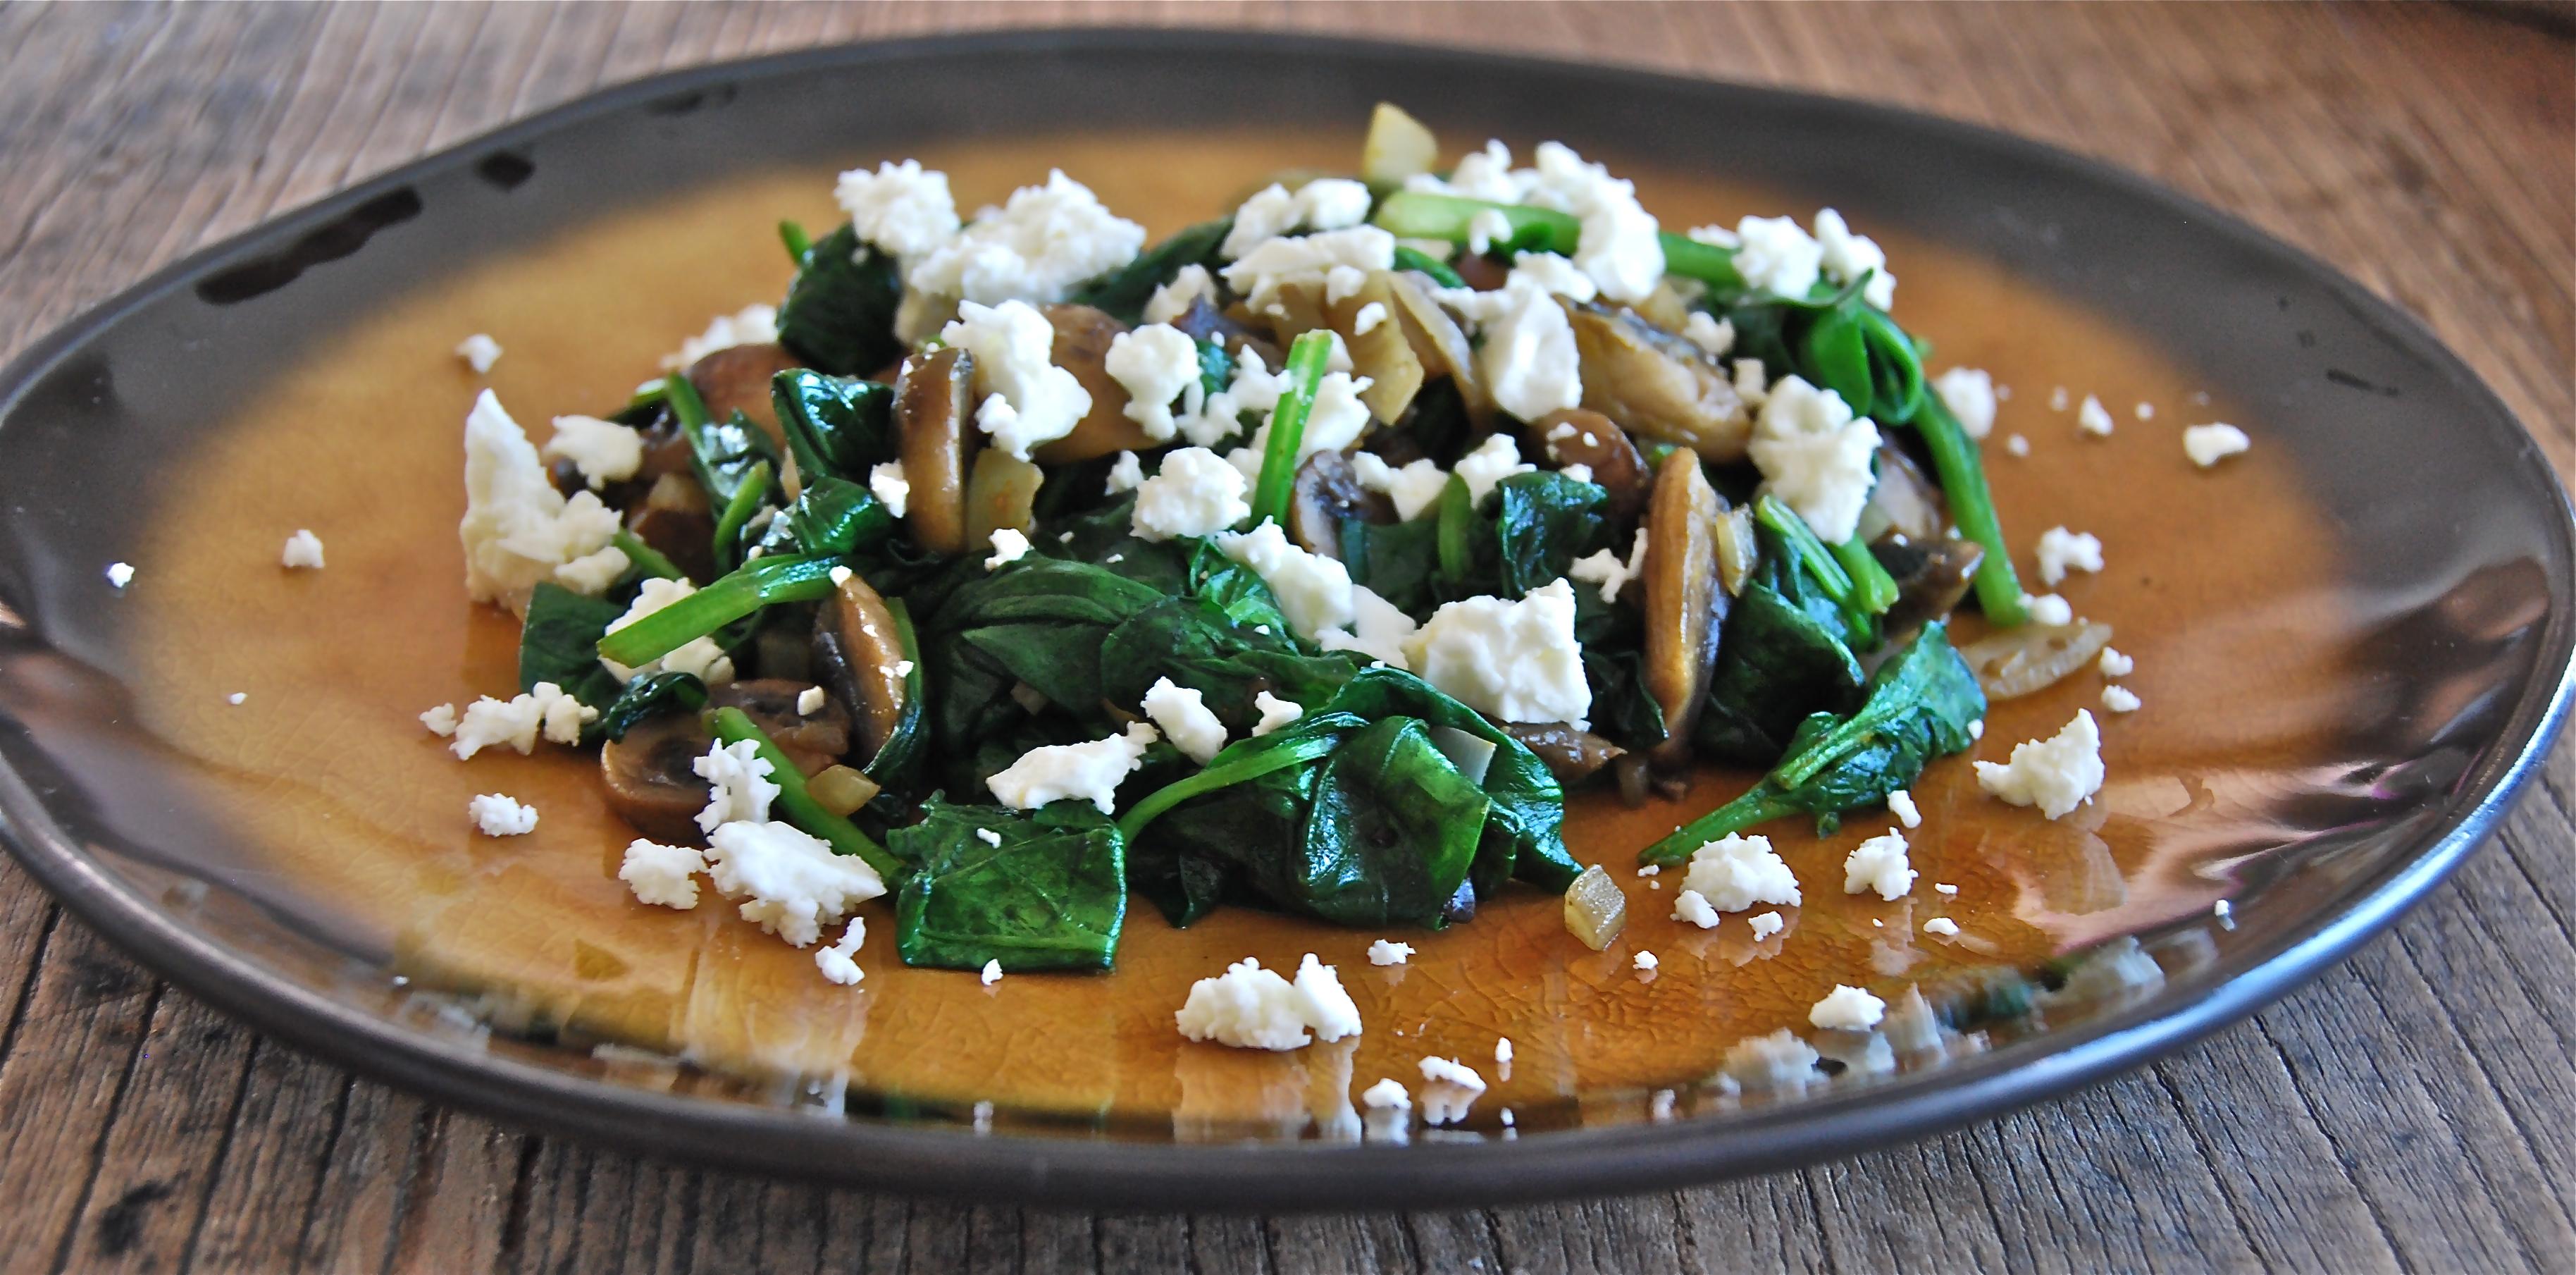 Warme spinazie met champignons en feta - Truitjeroermeniet.be